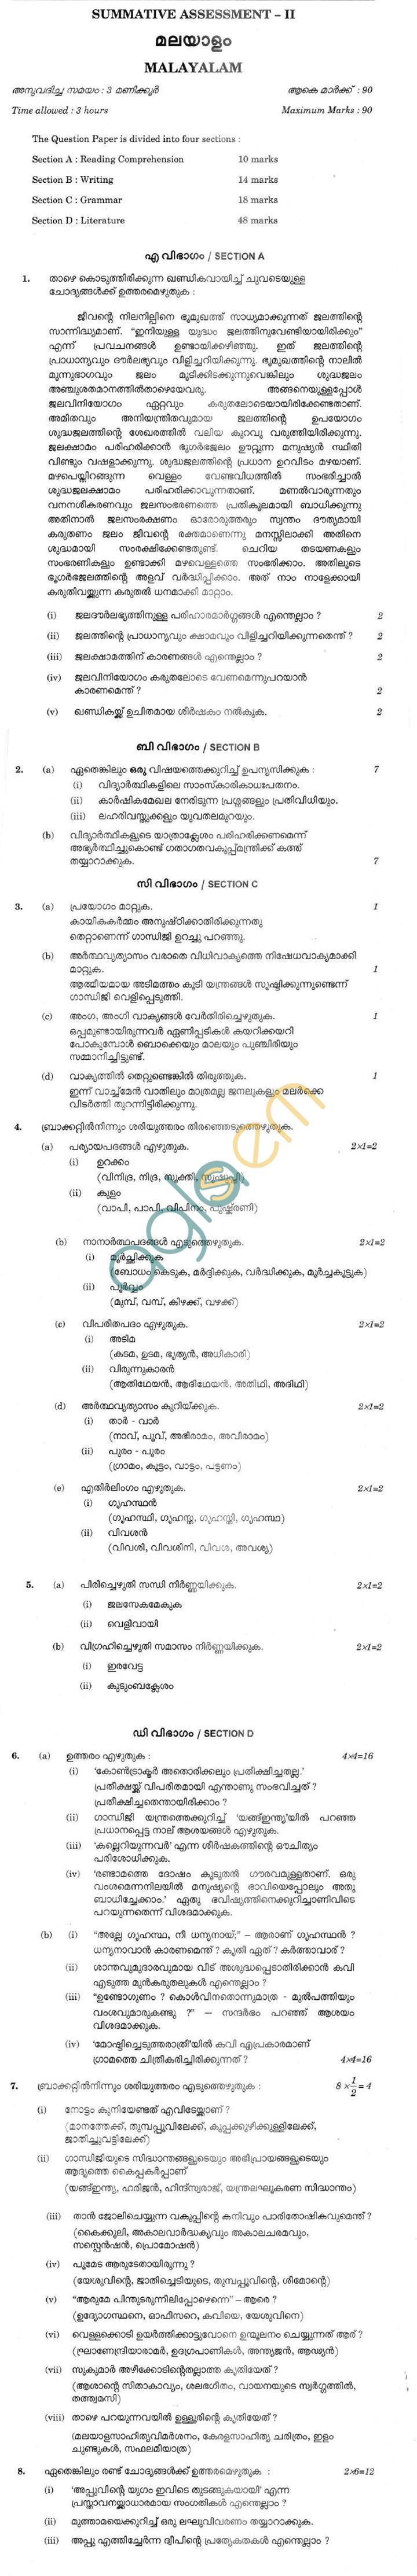 CBSE Board Exam Class 10 SA2 Sample Question Paper – Malayalam